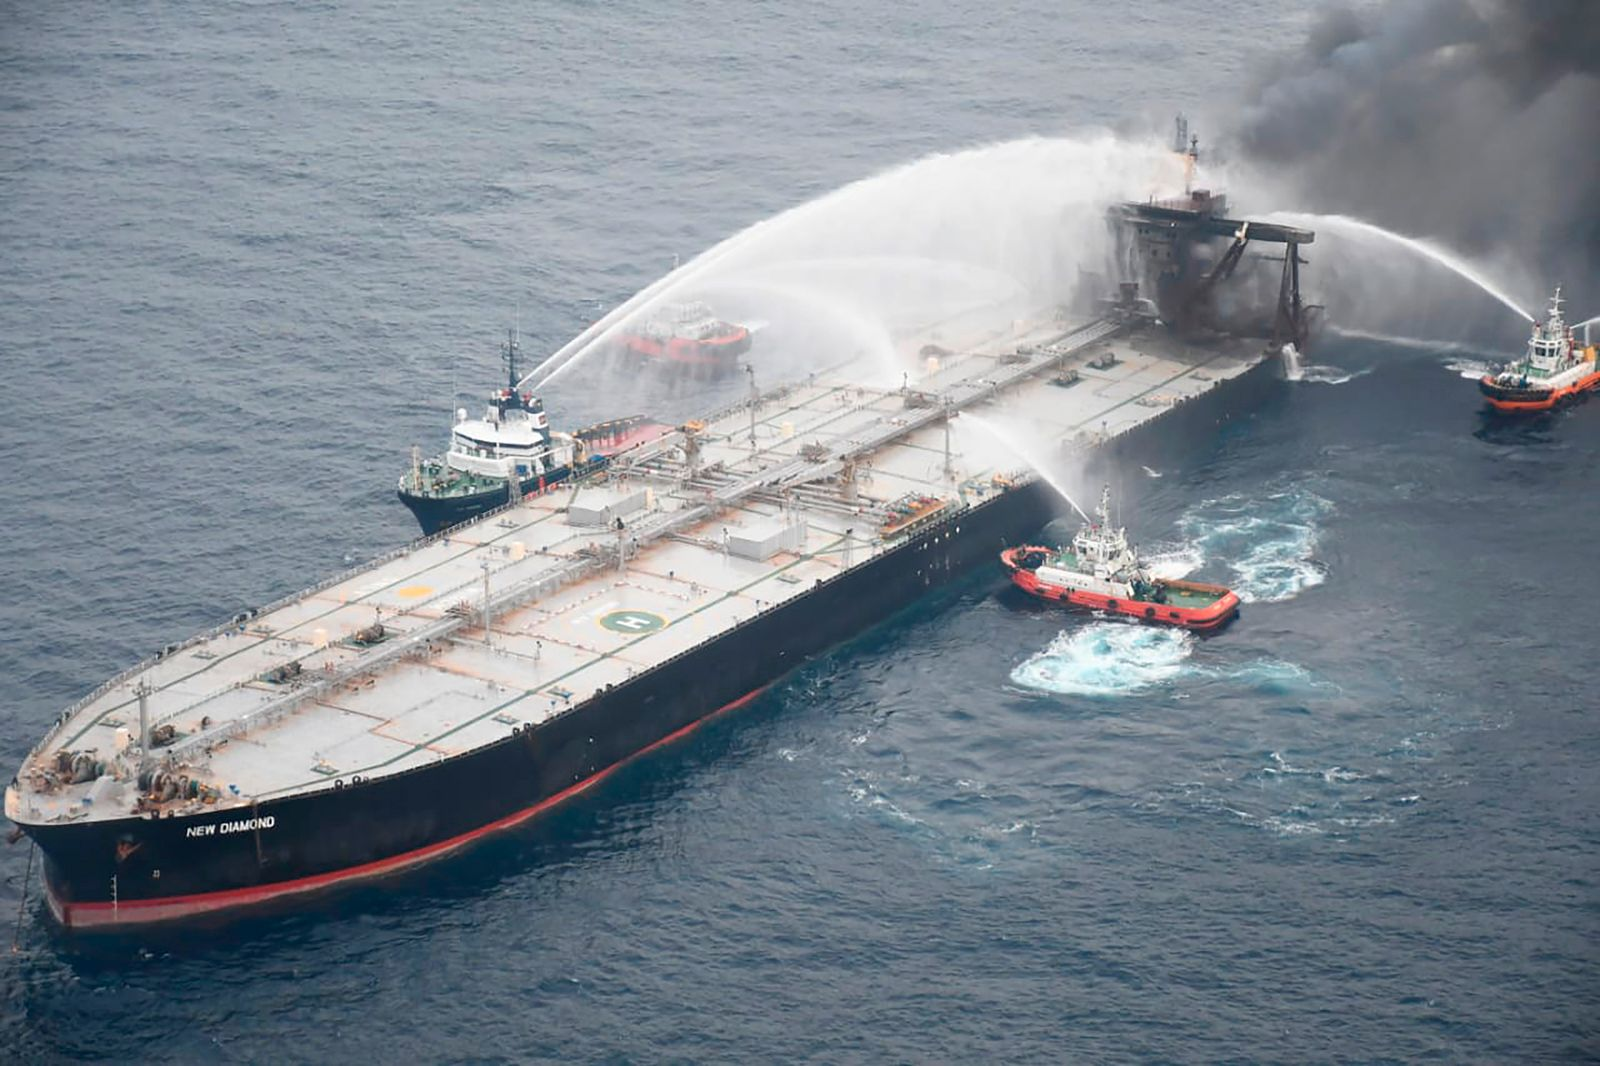 Brand auf Öltanker vor Sri Lanka